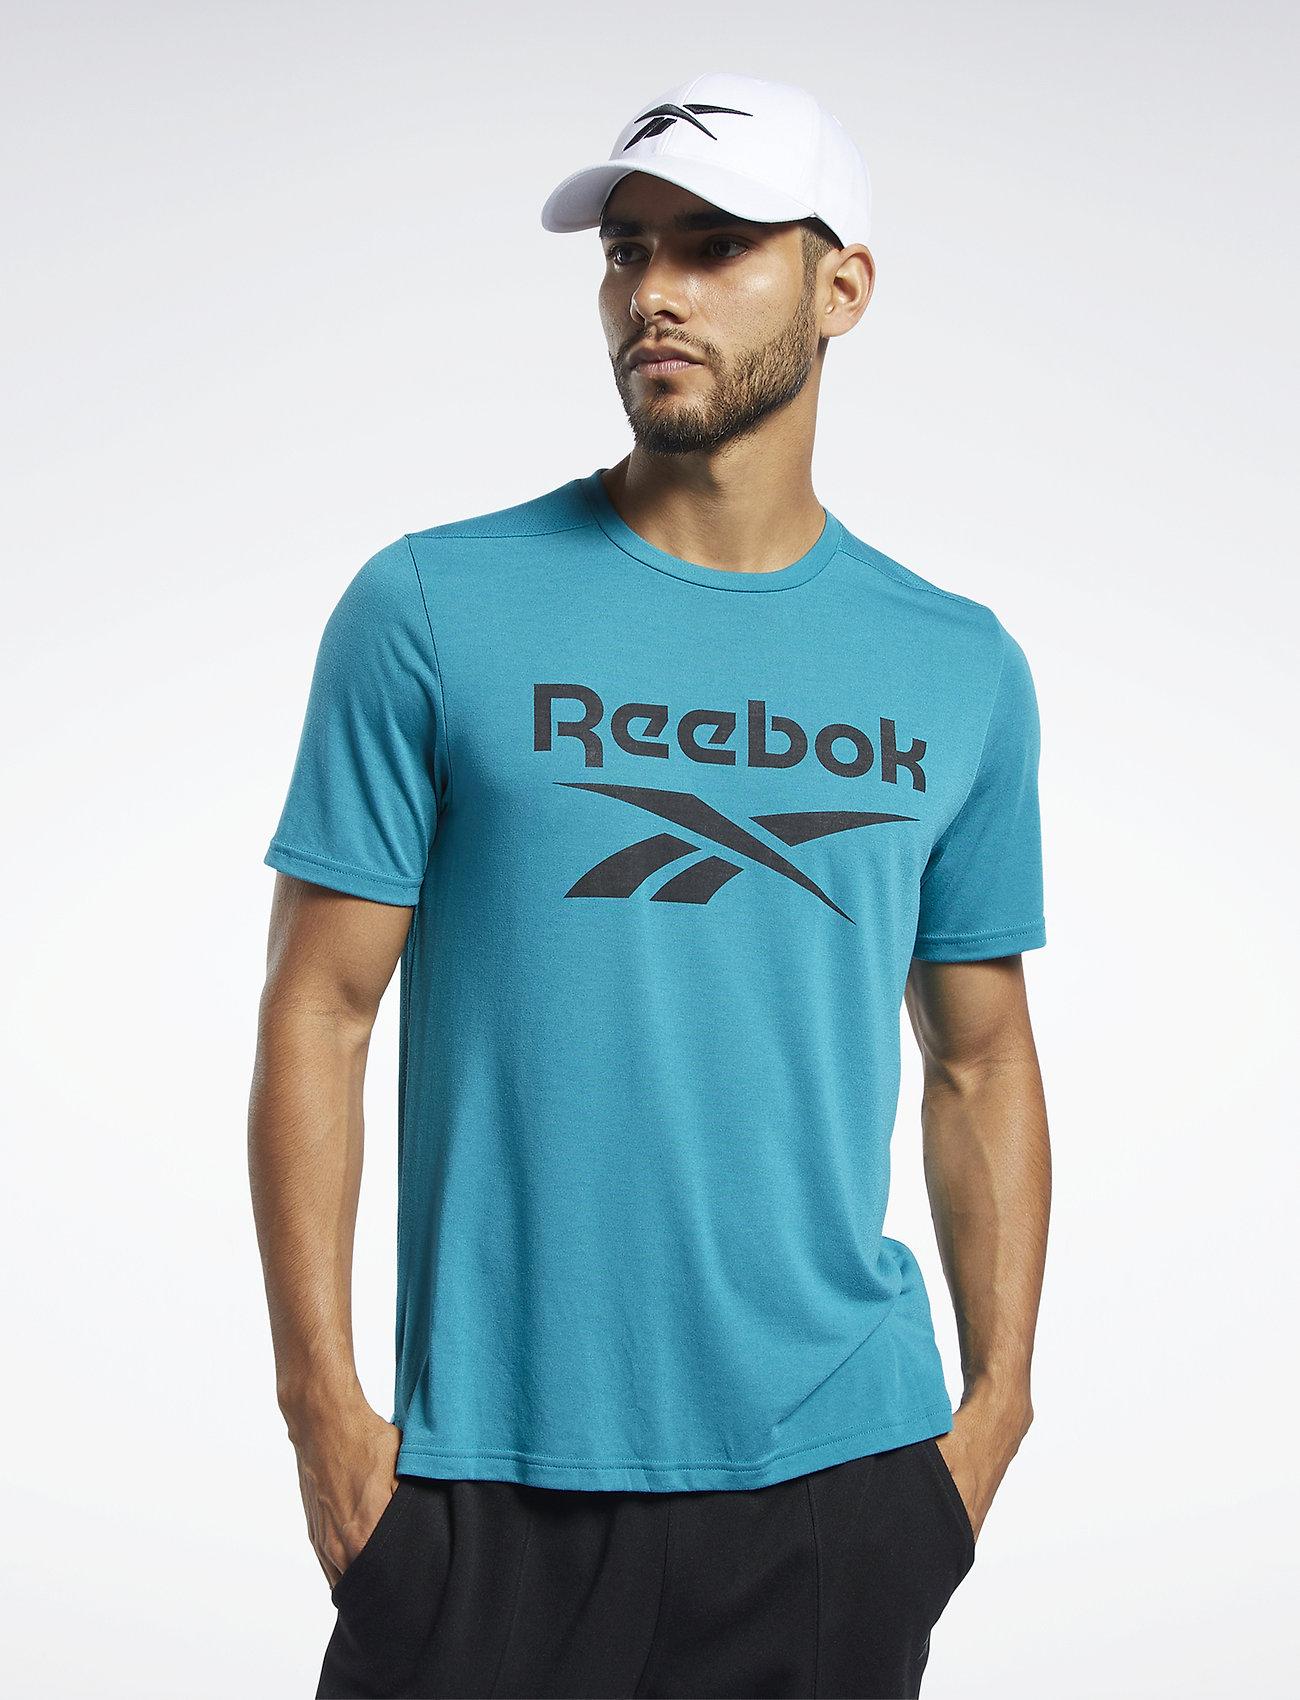 Reebok Performance Workout Ready Supremium Graphic Tee - T-shirts SEATEA Bkmo6F9T